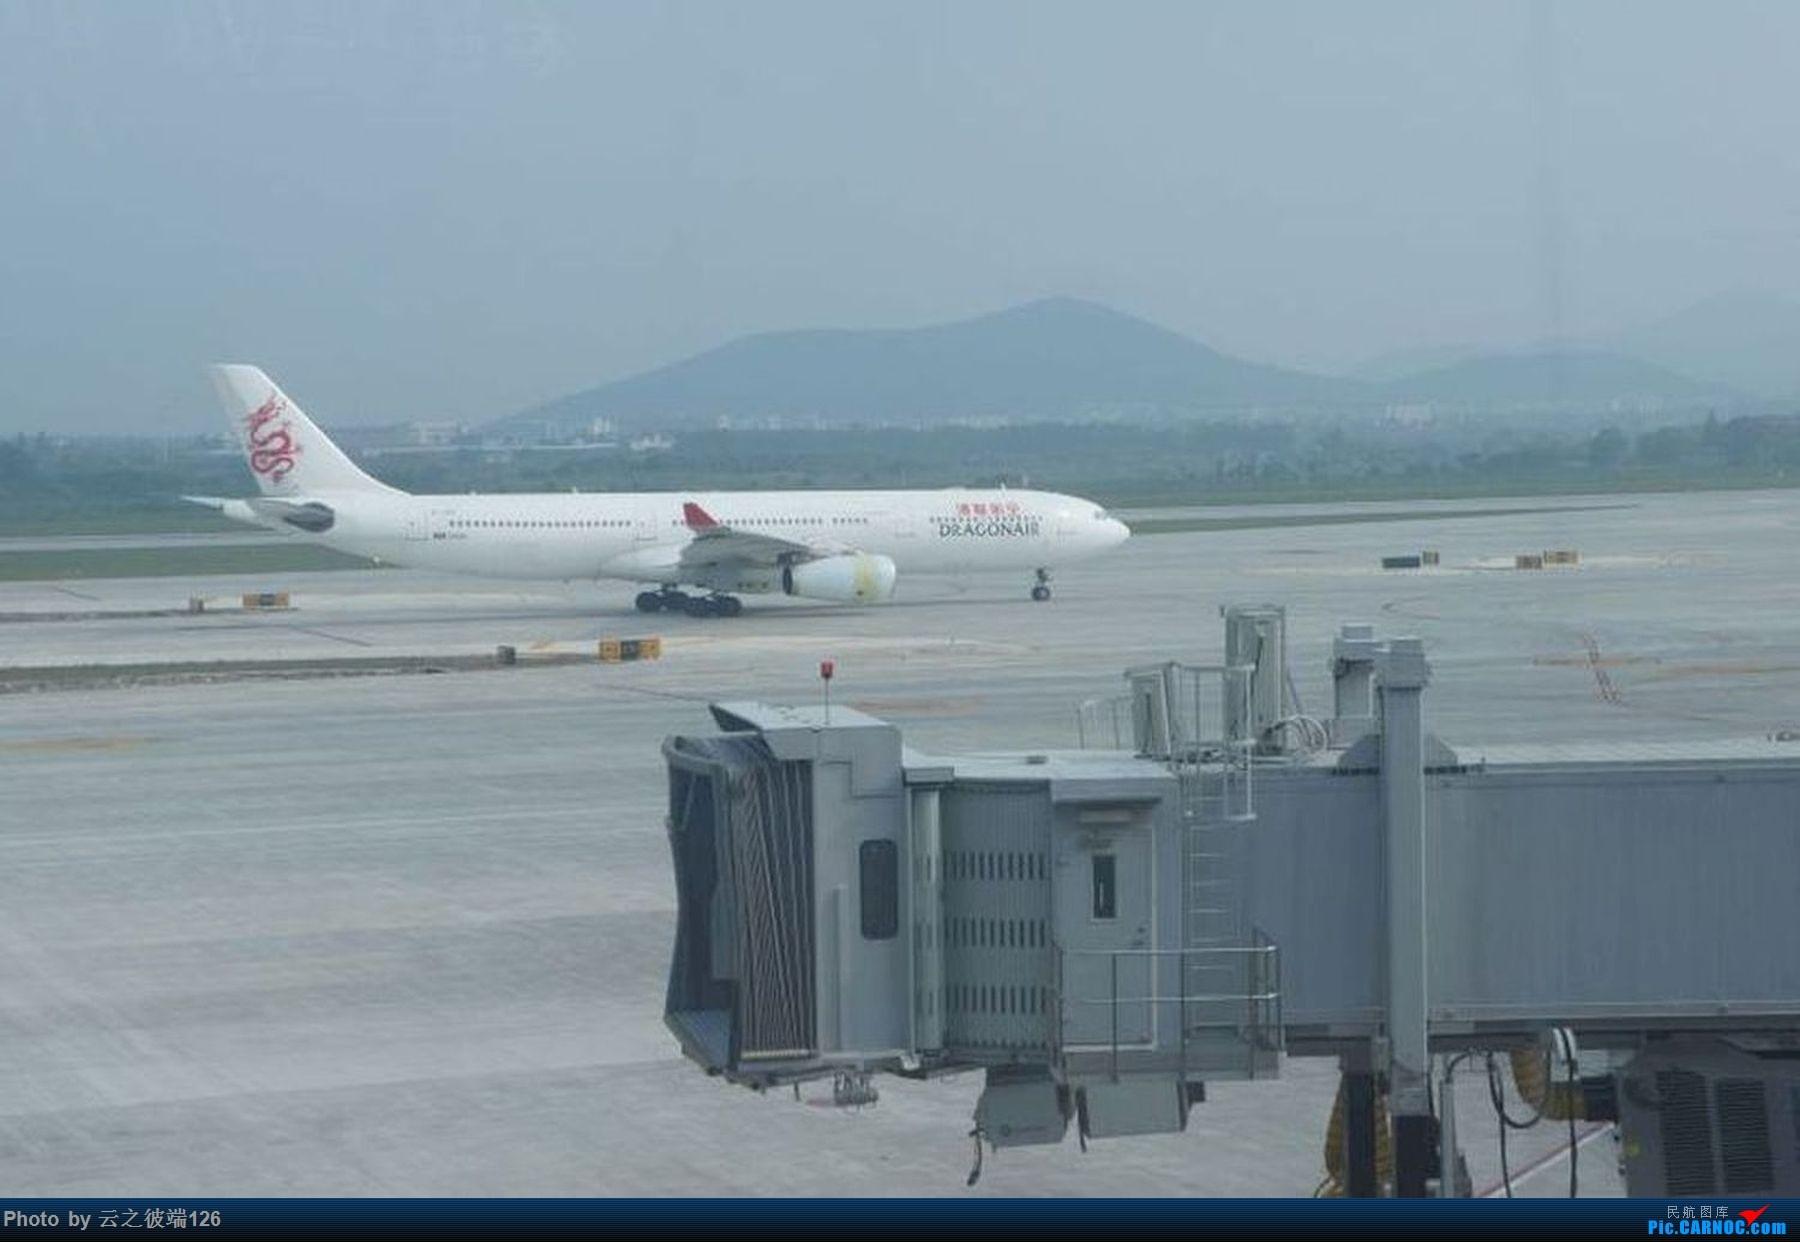 Re:[原创]迟到两年的游记 -----------NKG-SZX-NKG ZH+白菜航------ AIRBUS A330-300 B-LAB 中国南京禄口国际机场